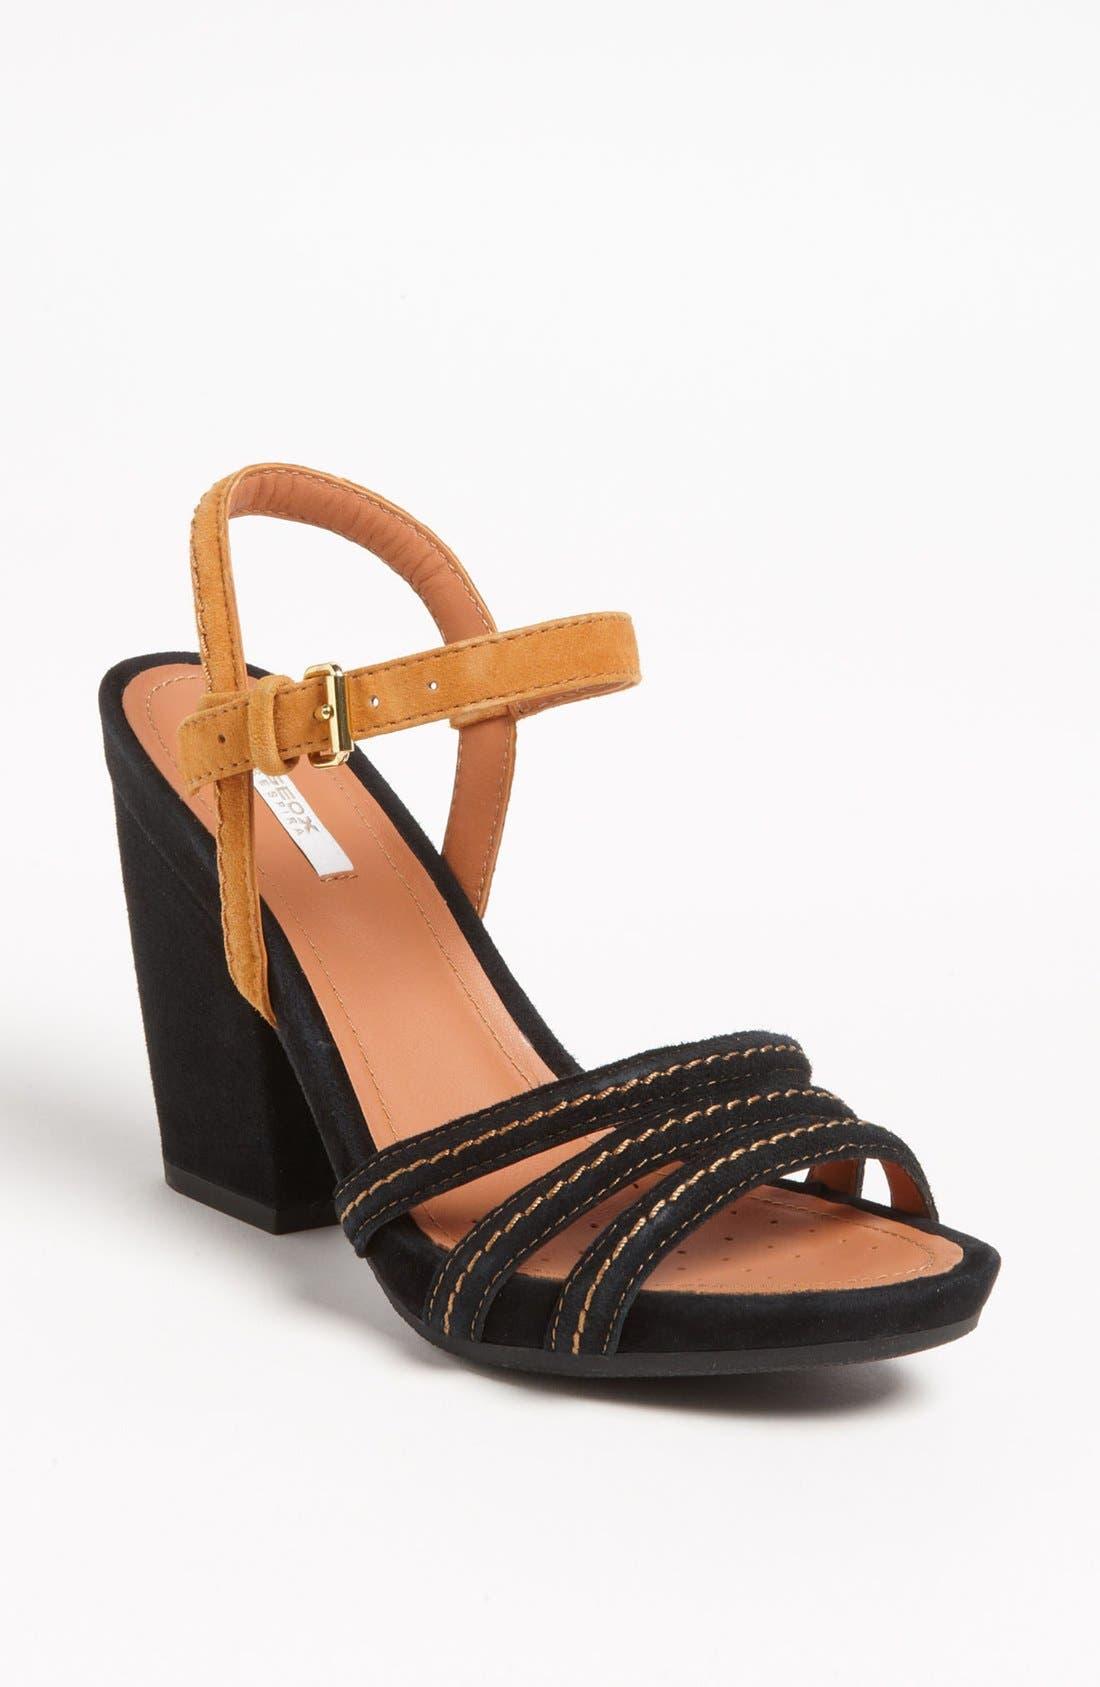 Alternate Image 1 Selected - Geox 'Divinity' Sandal